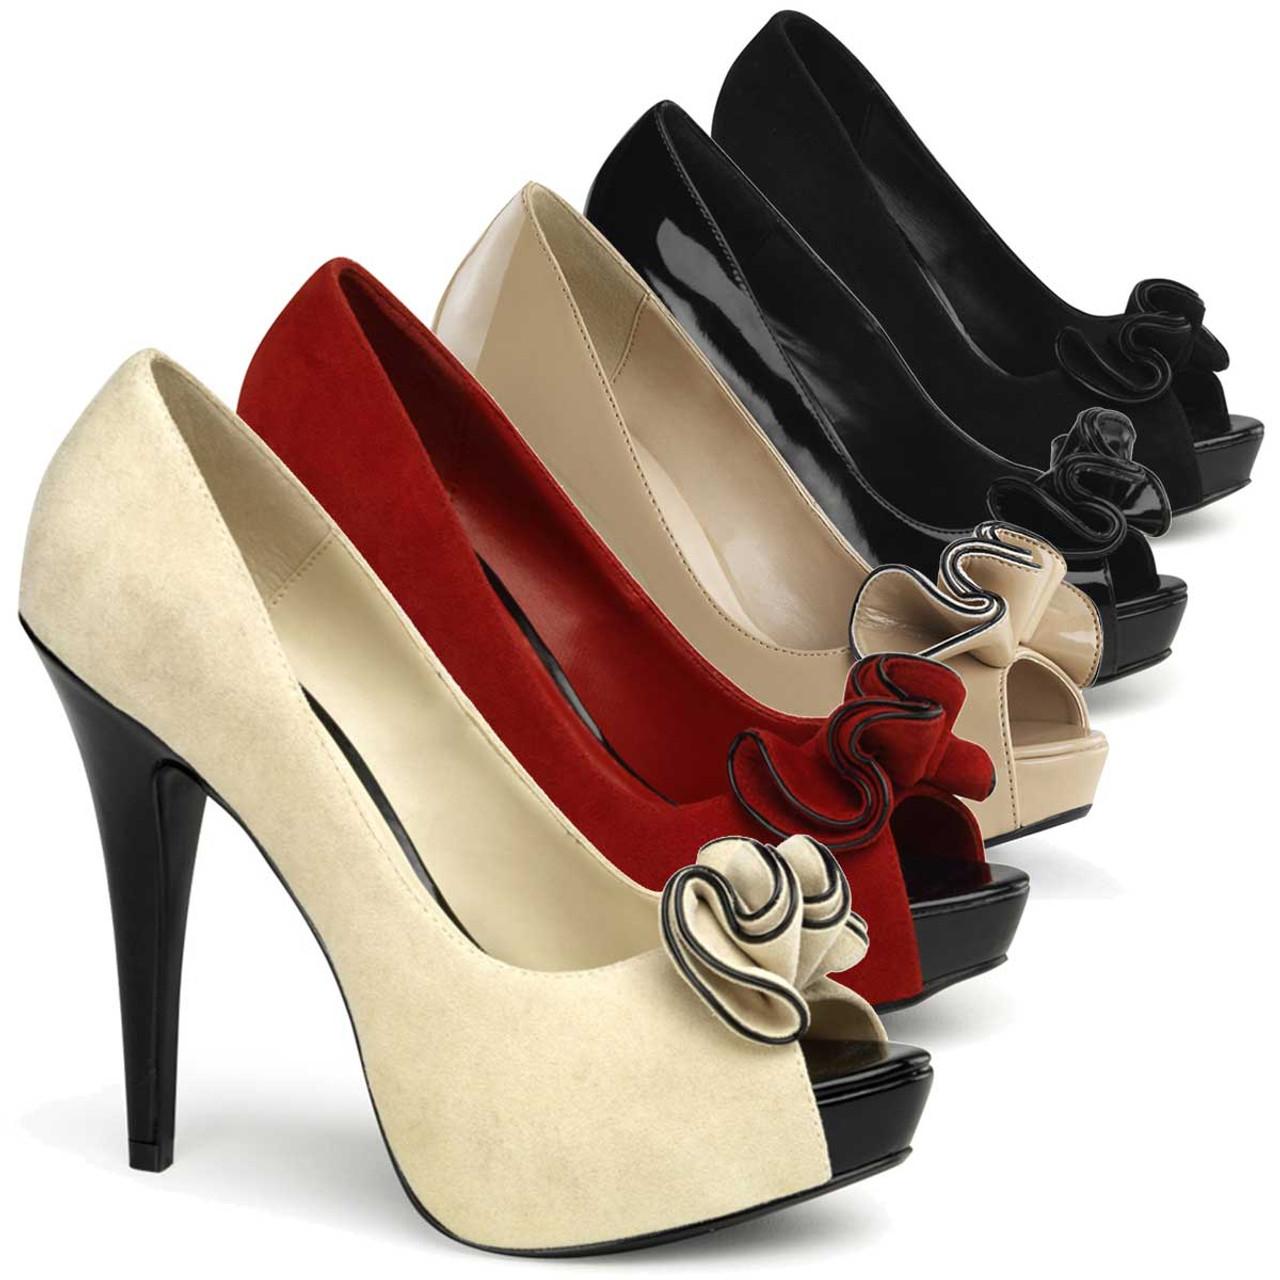 "PIN UP COUTURE Lolita-10 5/"" Heel Open Toe Platform Pump"